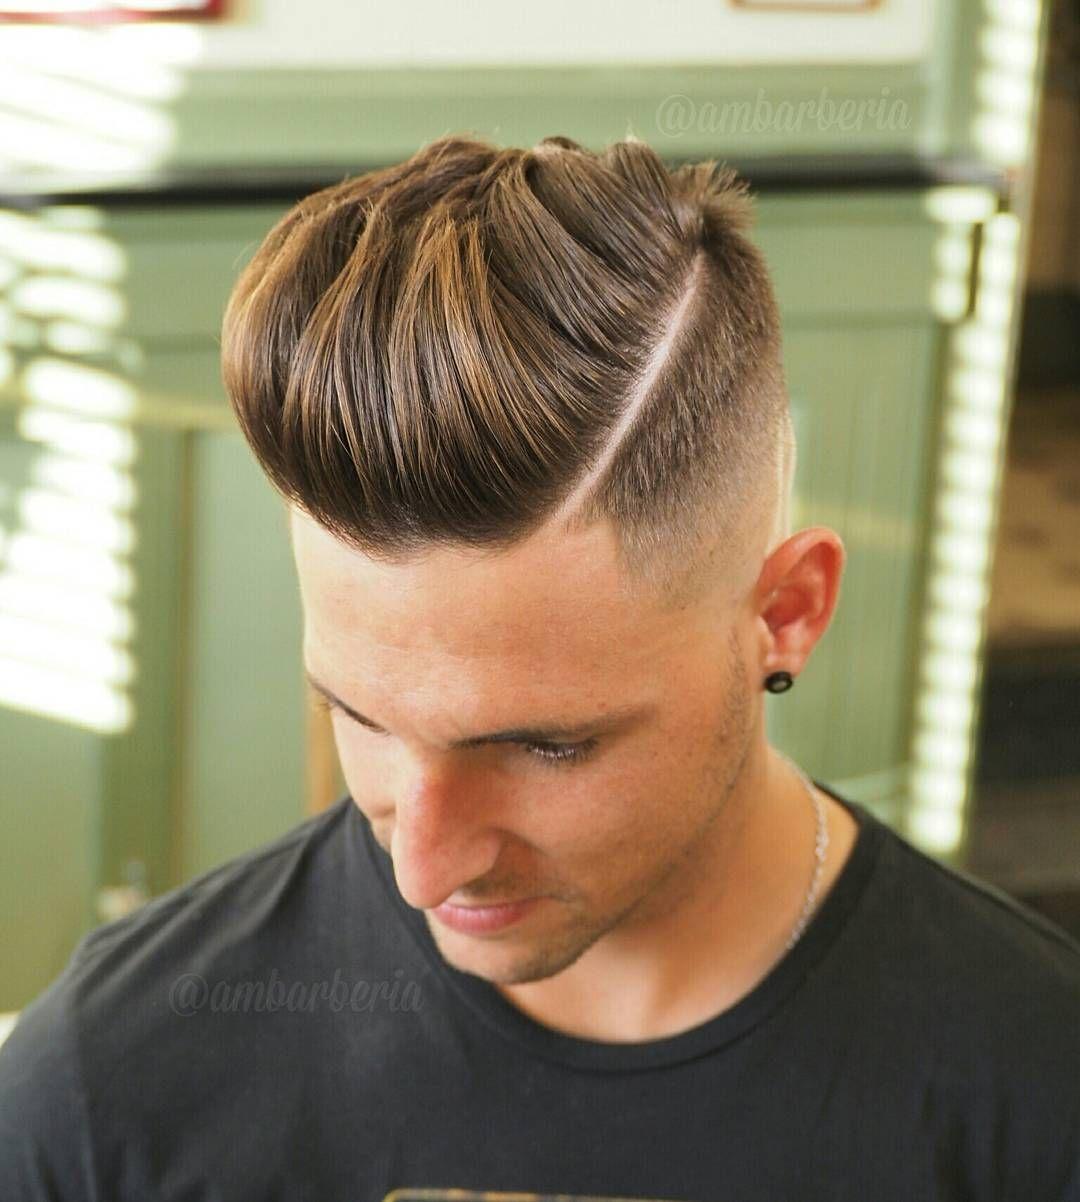 Men's hard part haircut  popular haircuts for men   high fade haircut high fade and